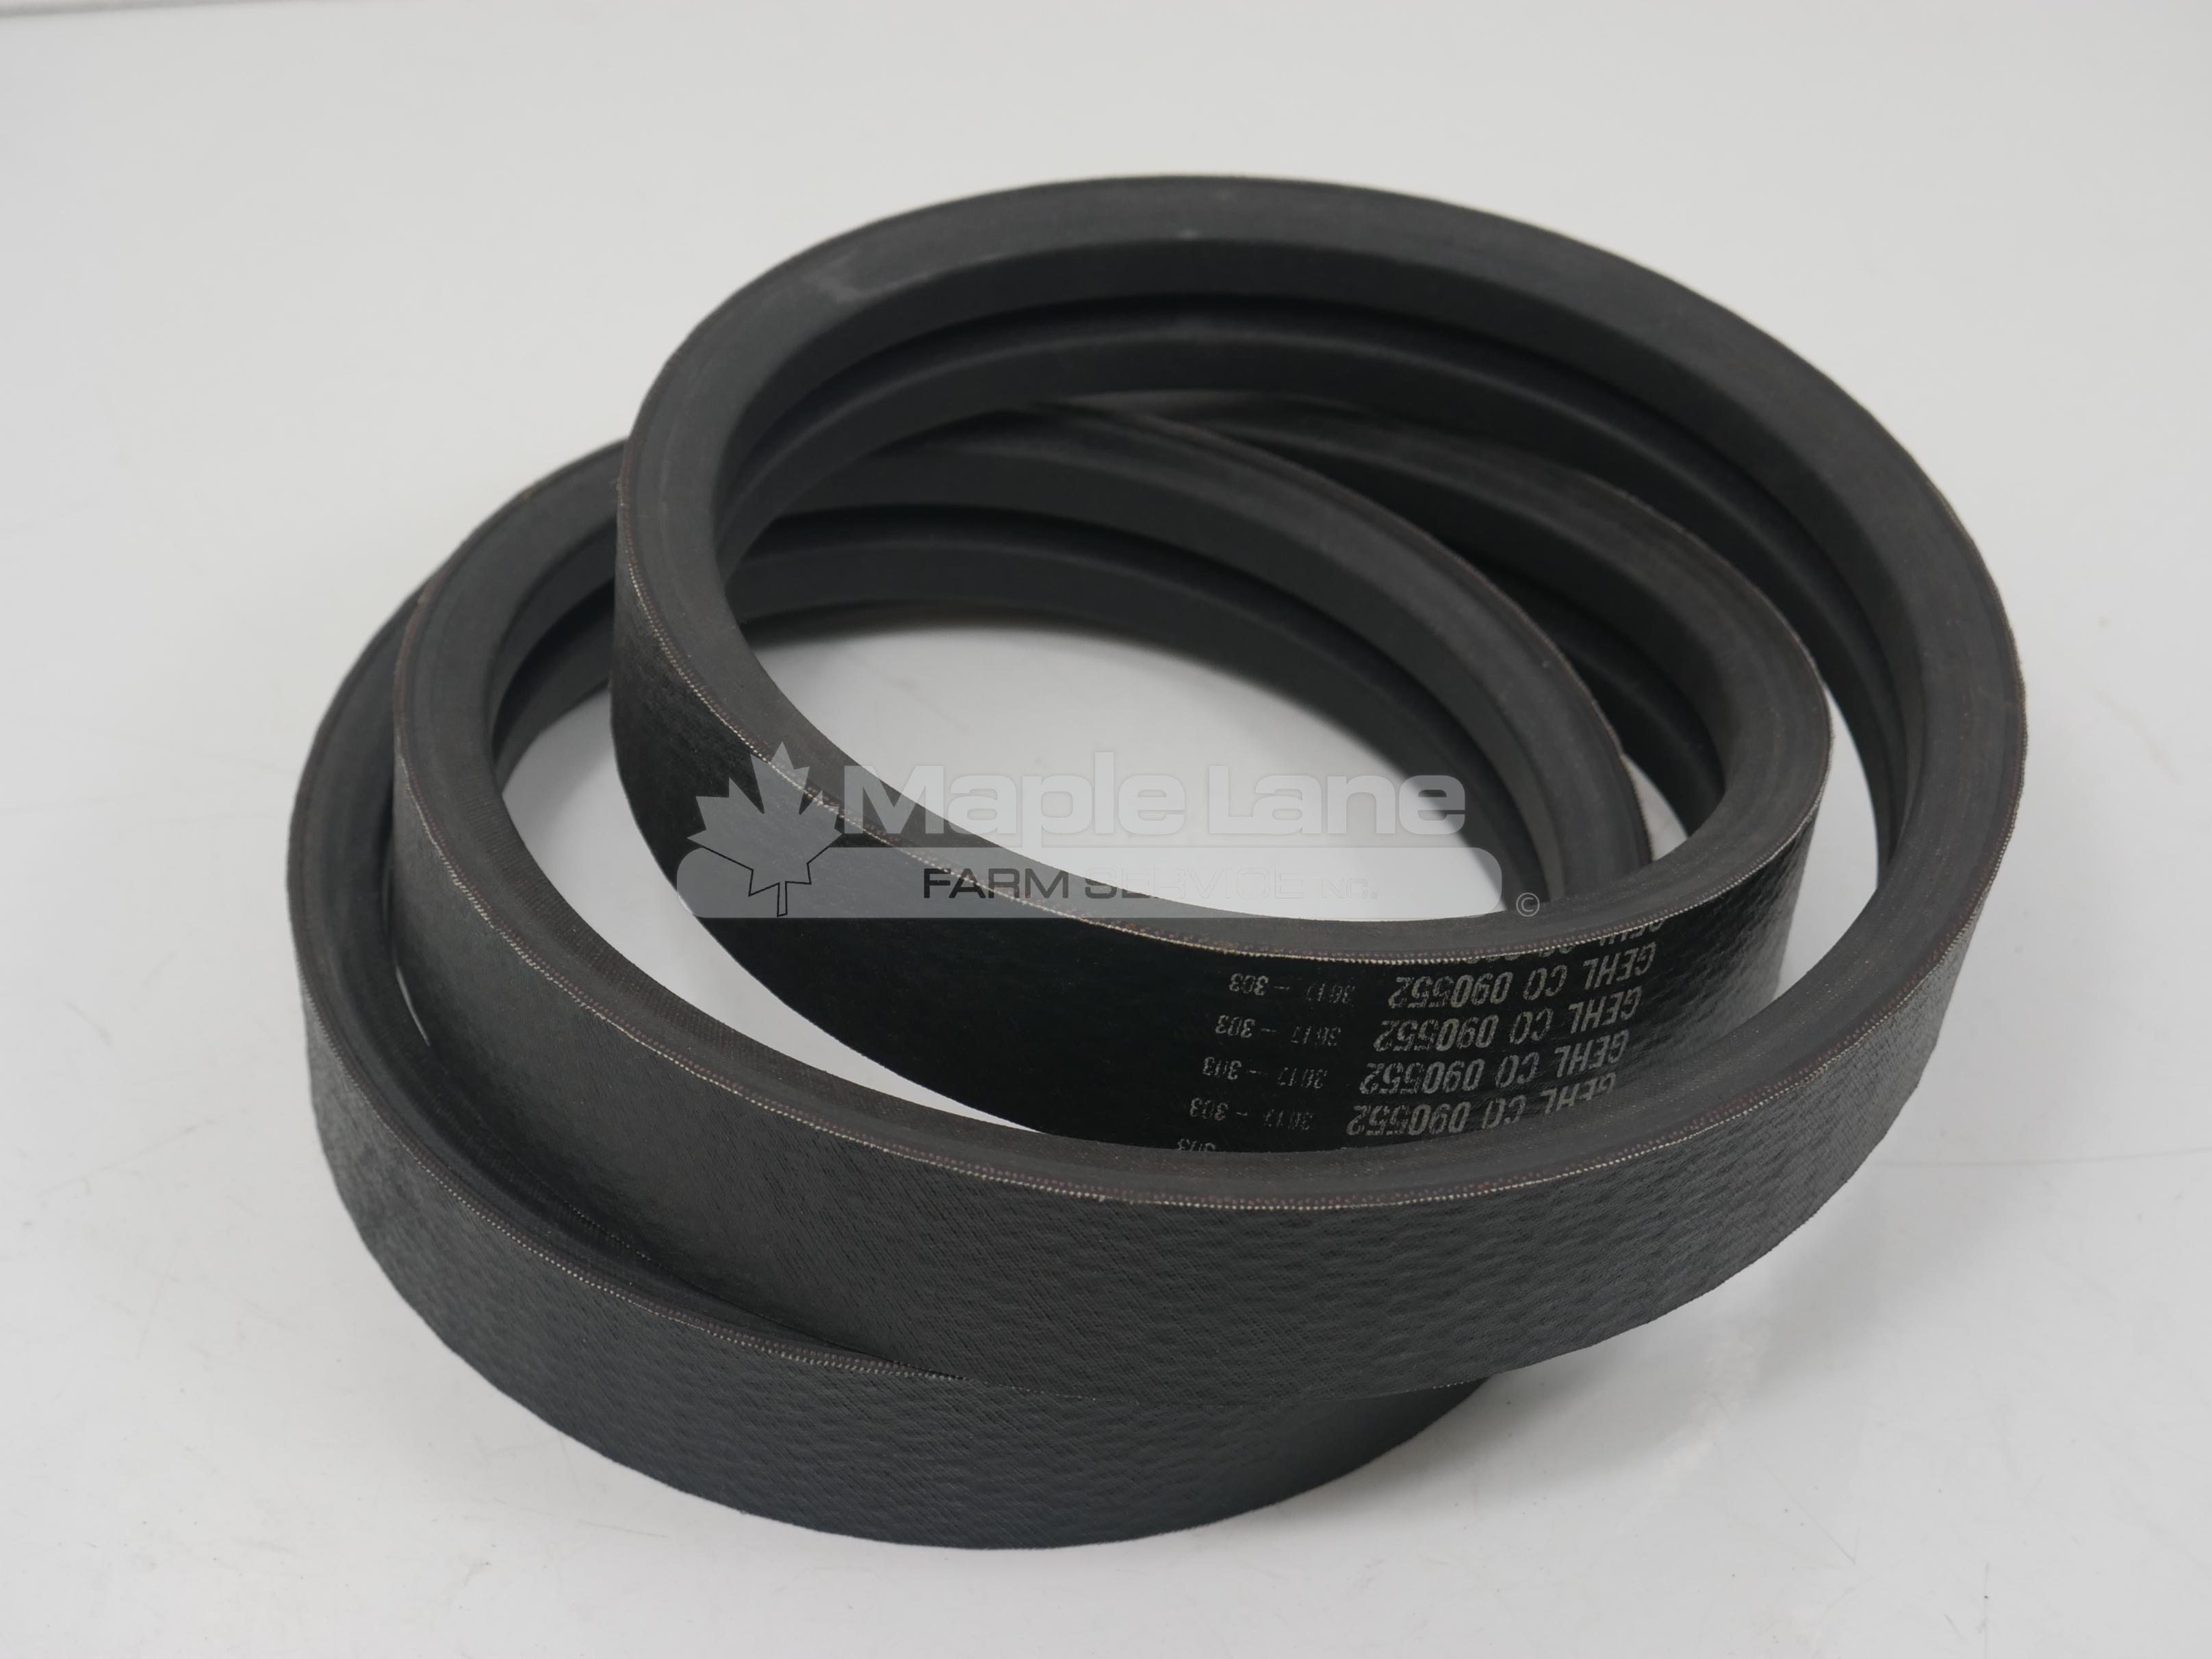 090552 Power Band Belt